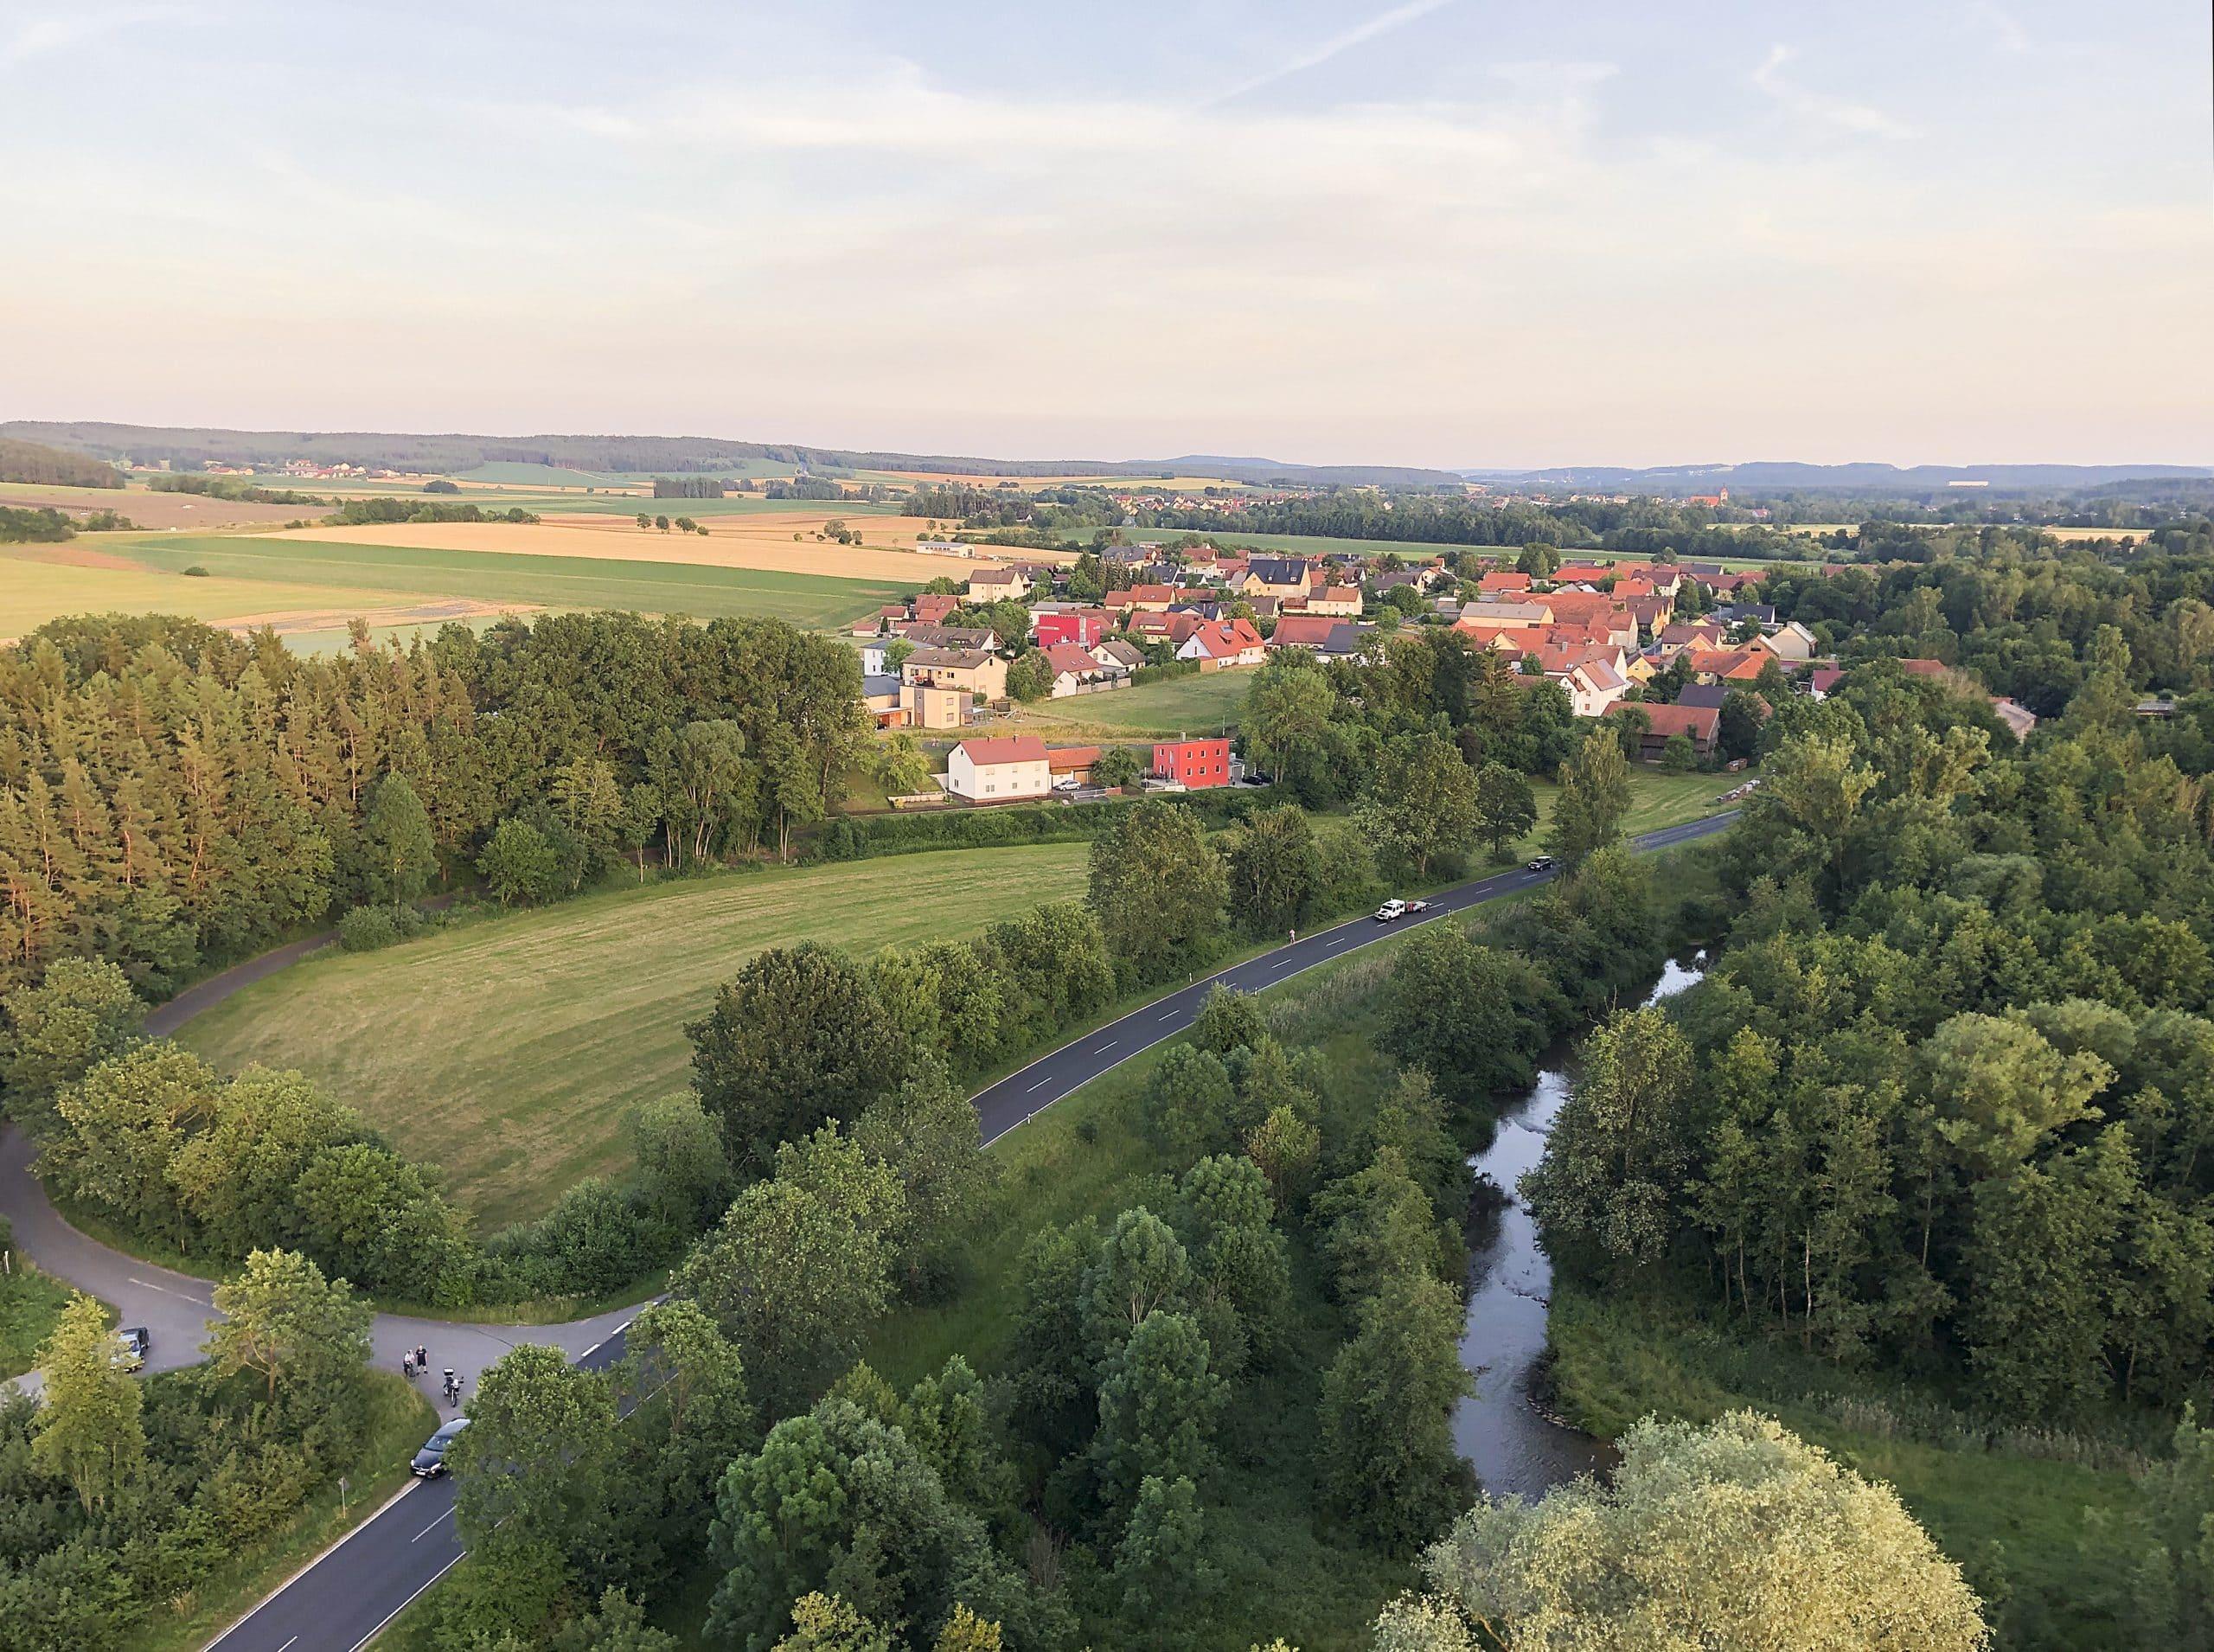 Jugendamt Amberg Sulzbach